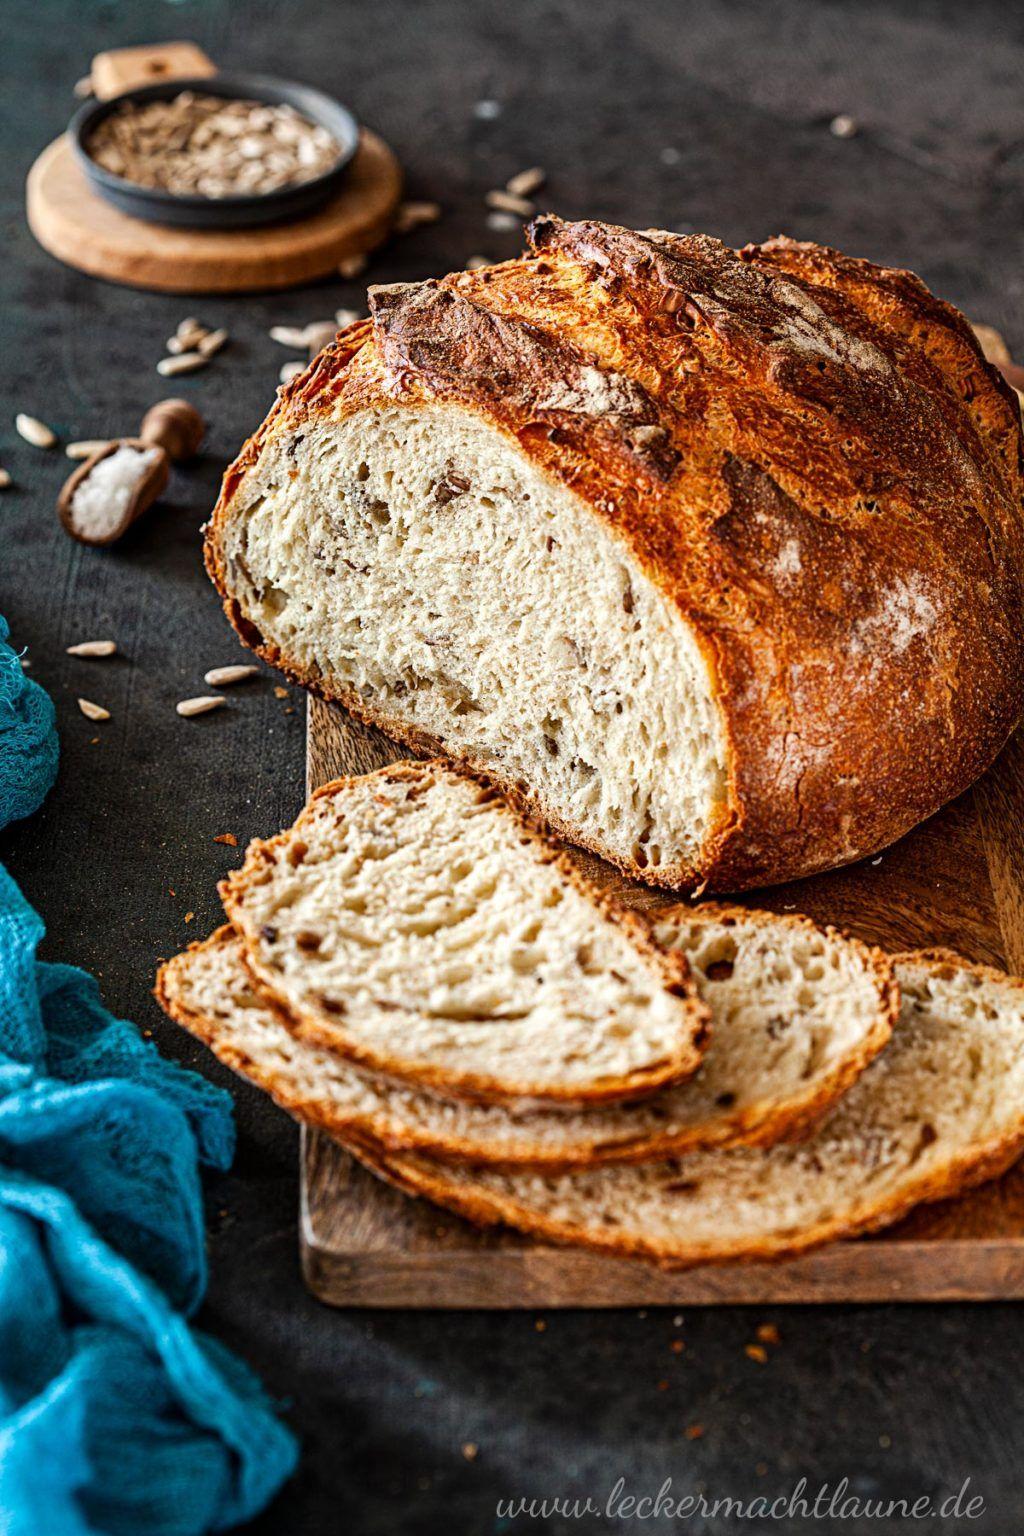 Photo of Joghurt-Dinkel-Brot aus dem Topf | lecker macht laune